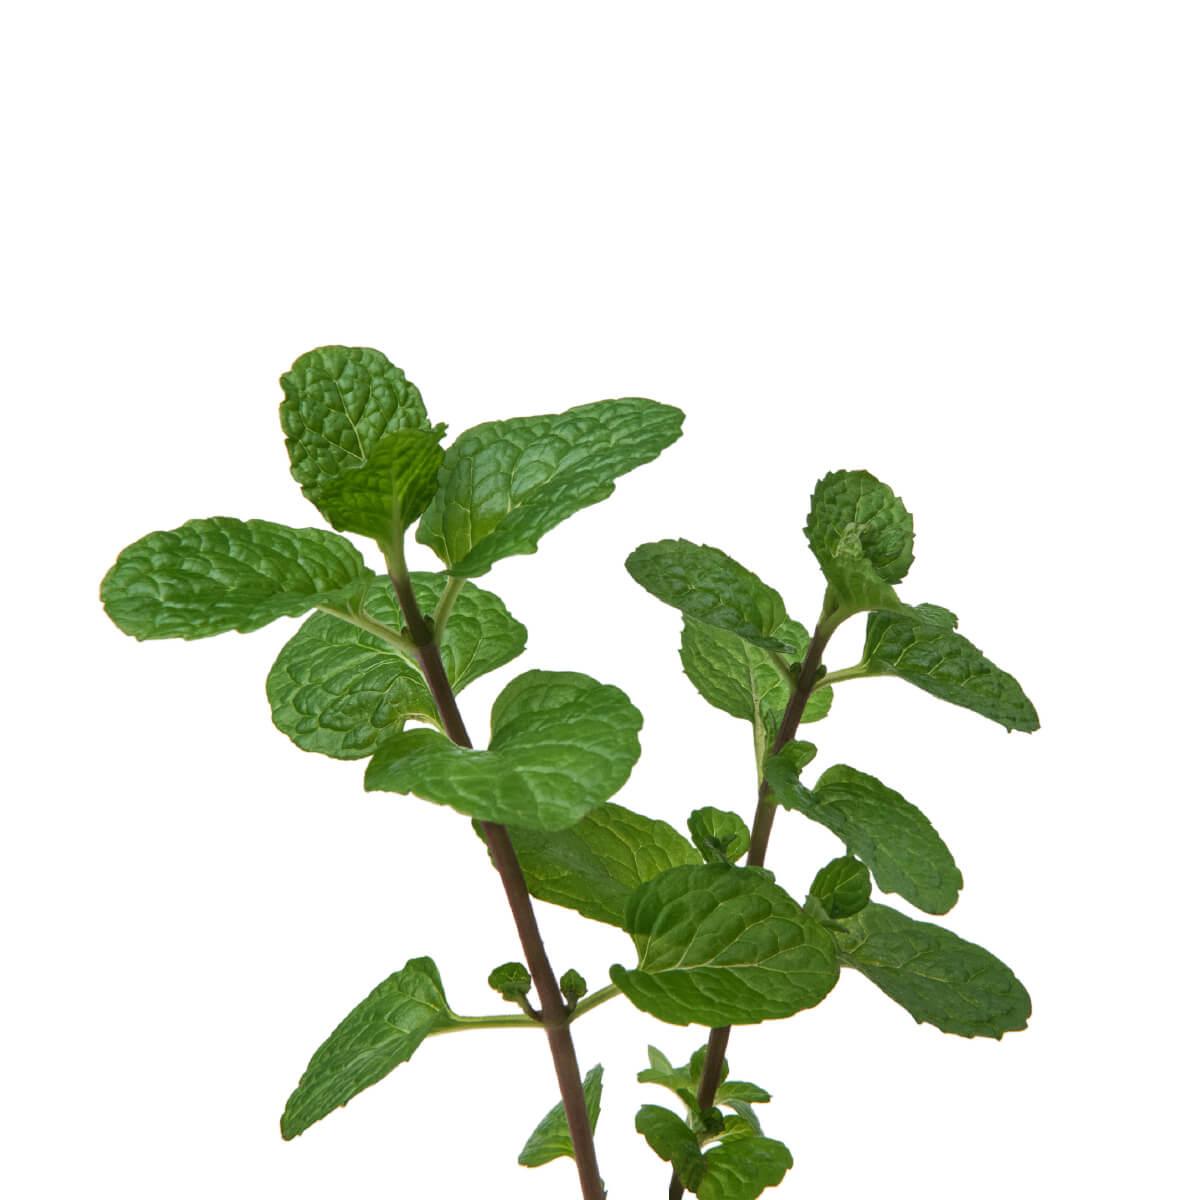 Sementes para plantar Hortelã em vasos autoirrigáveis RAIZ  - Loja Raiz